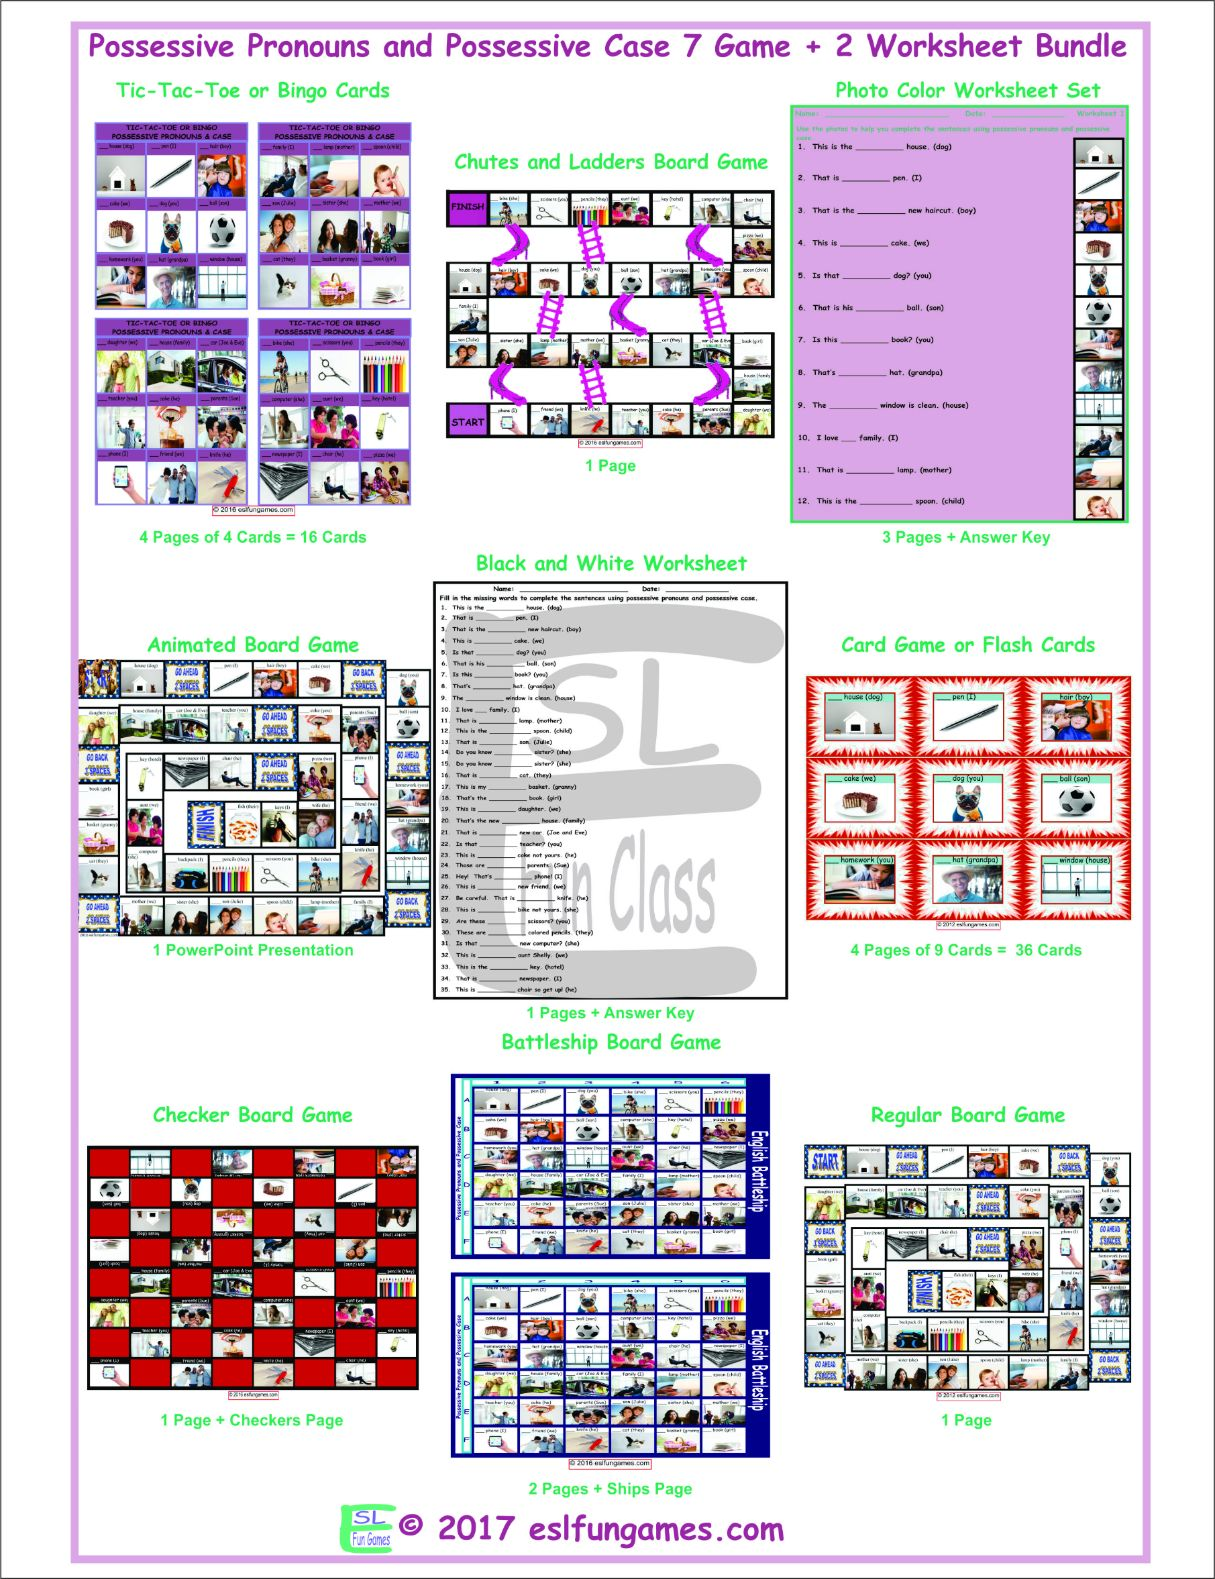 Possessive Pronouns and Possessive Case 7 Game Plus 2 Worksheet Bundle